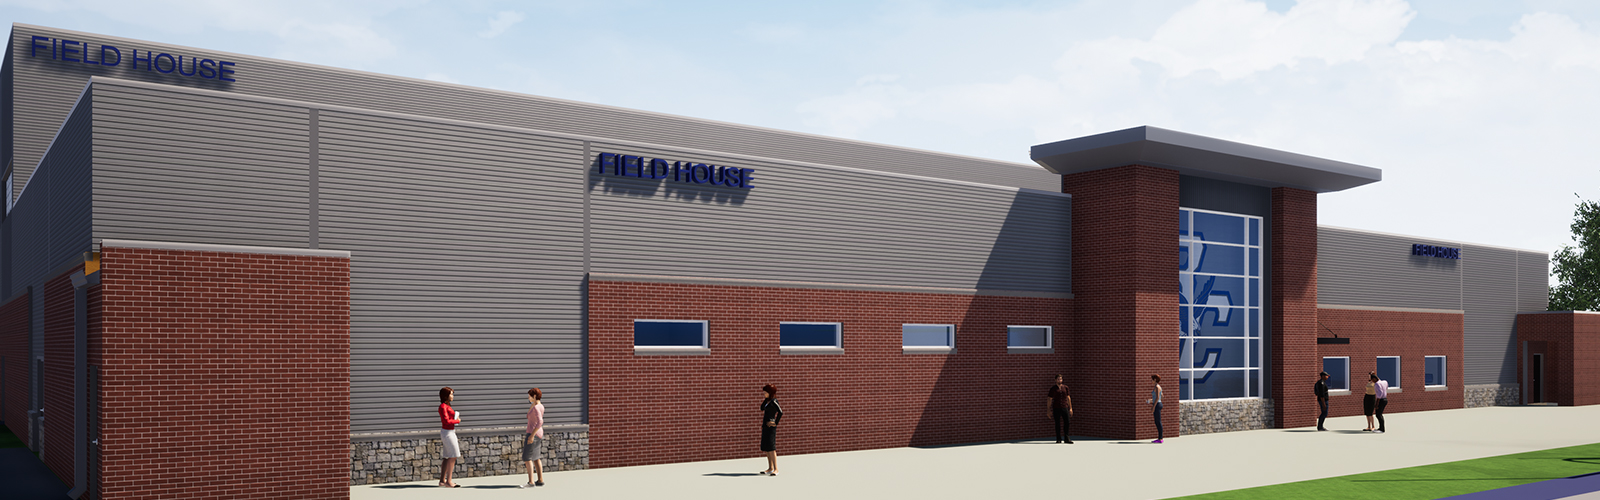 Rejoice-Field-House-Banner-1a